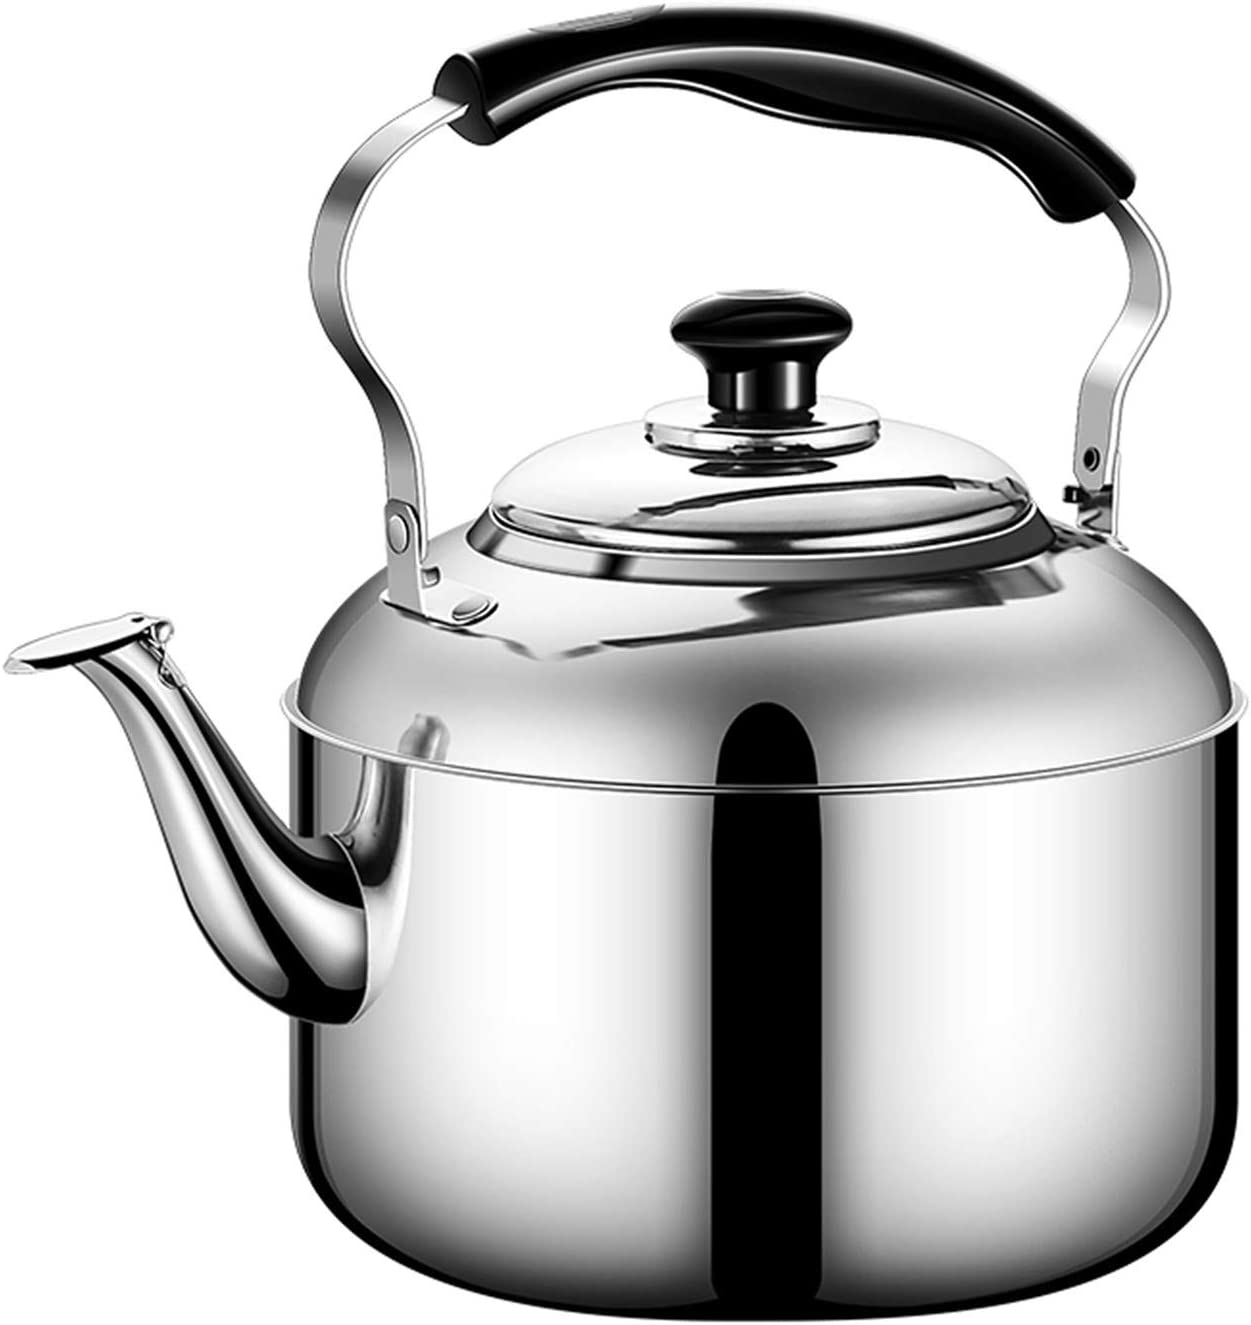 Whistling Kettles Bombing new work 304 Stainless Steel Tea Soldering Kettle Capacity Large